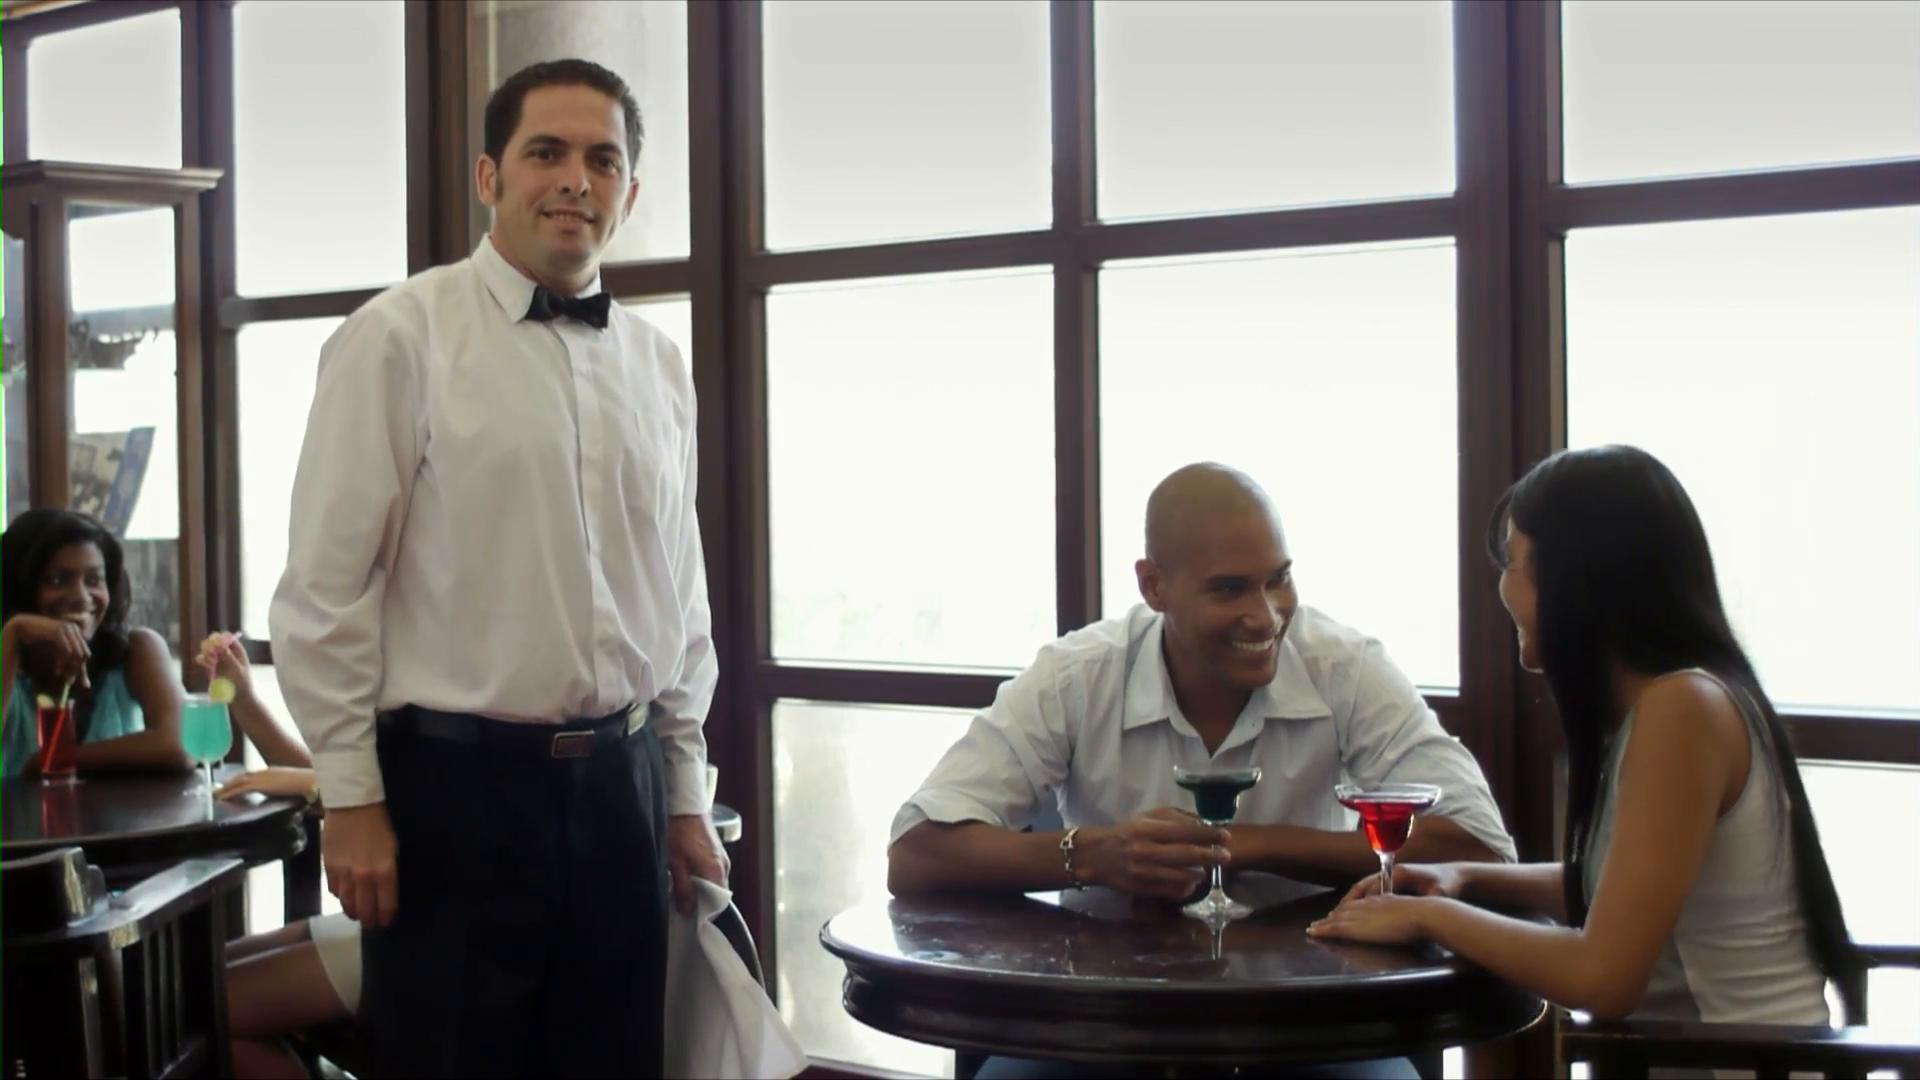 Waiter upselling customer at restaurant